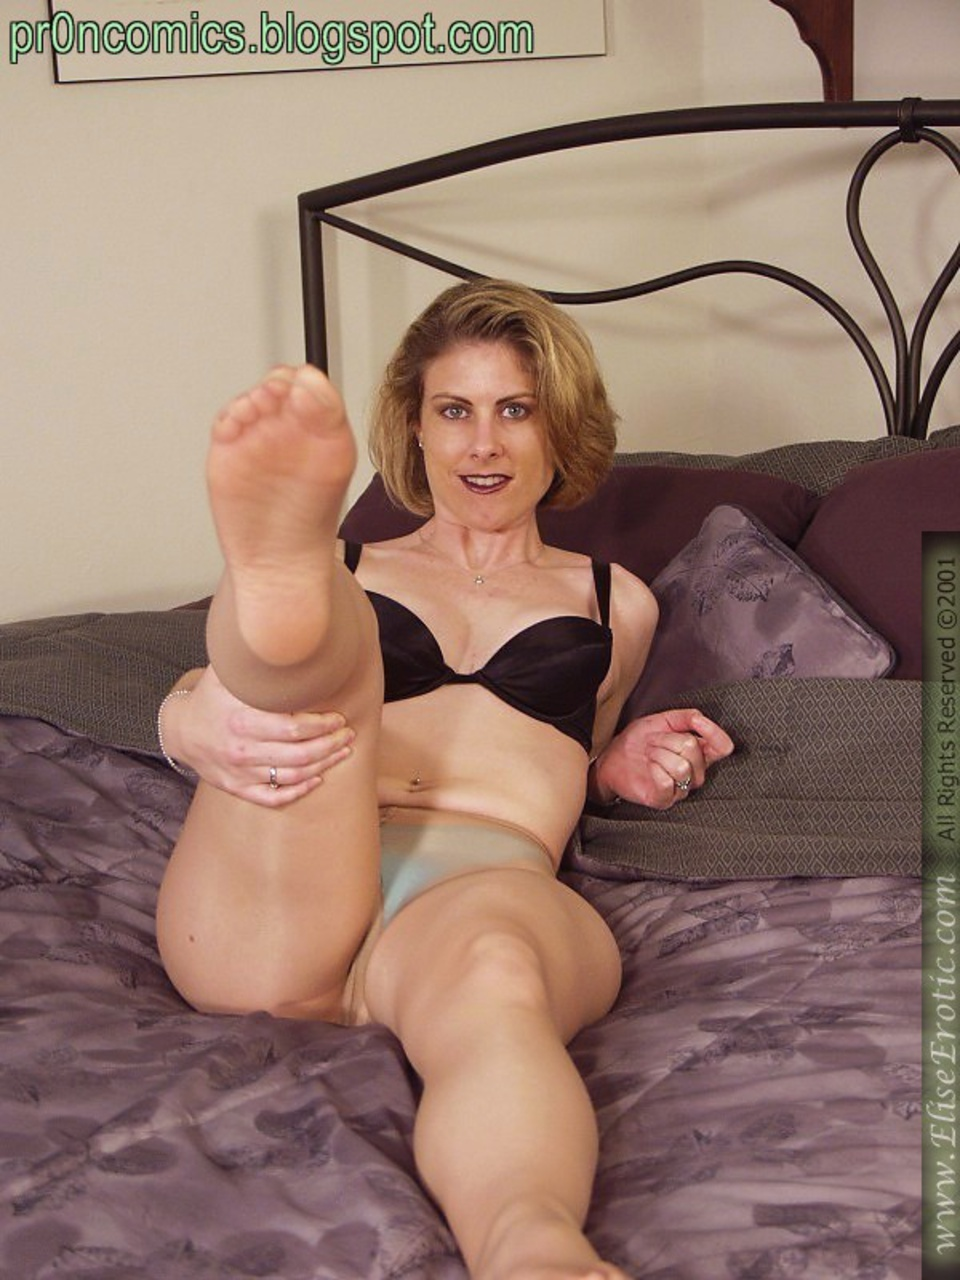 krivie-nogi-seks